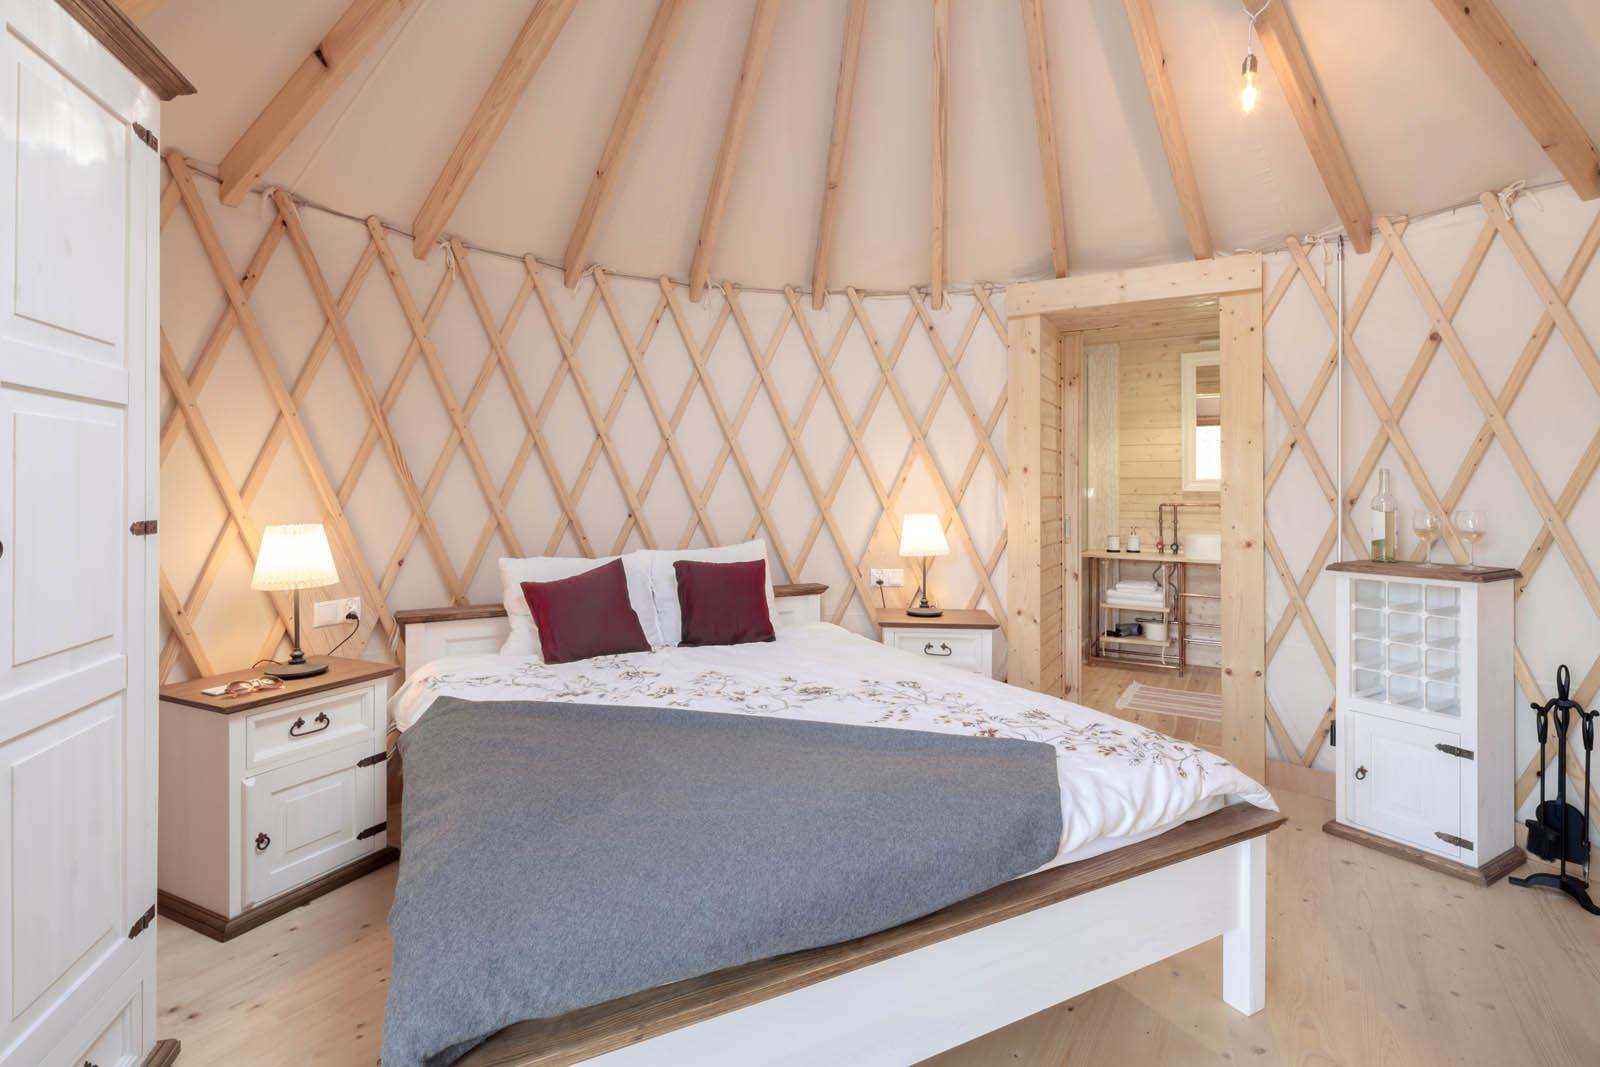 4rest Camp - Where will I sleep?